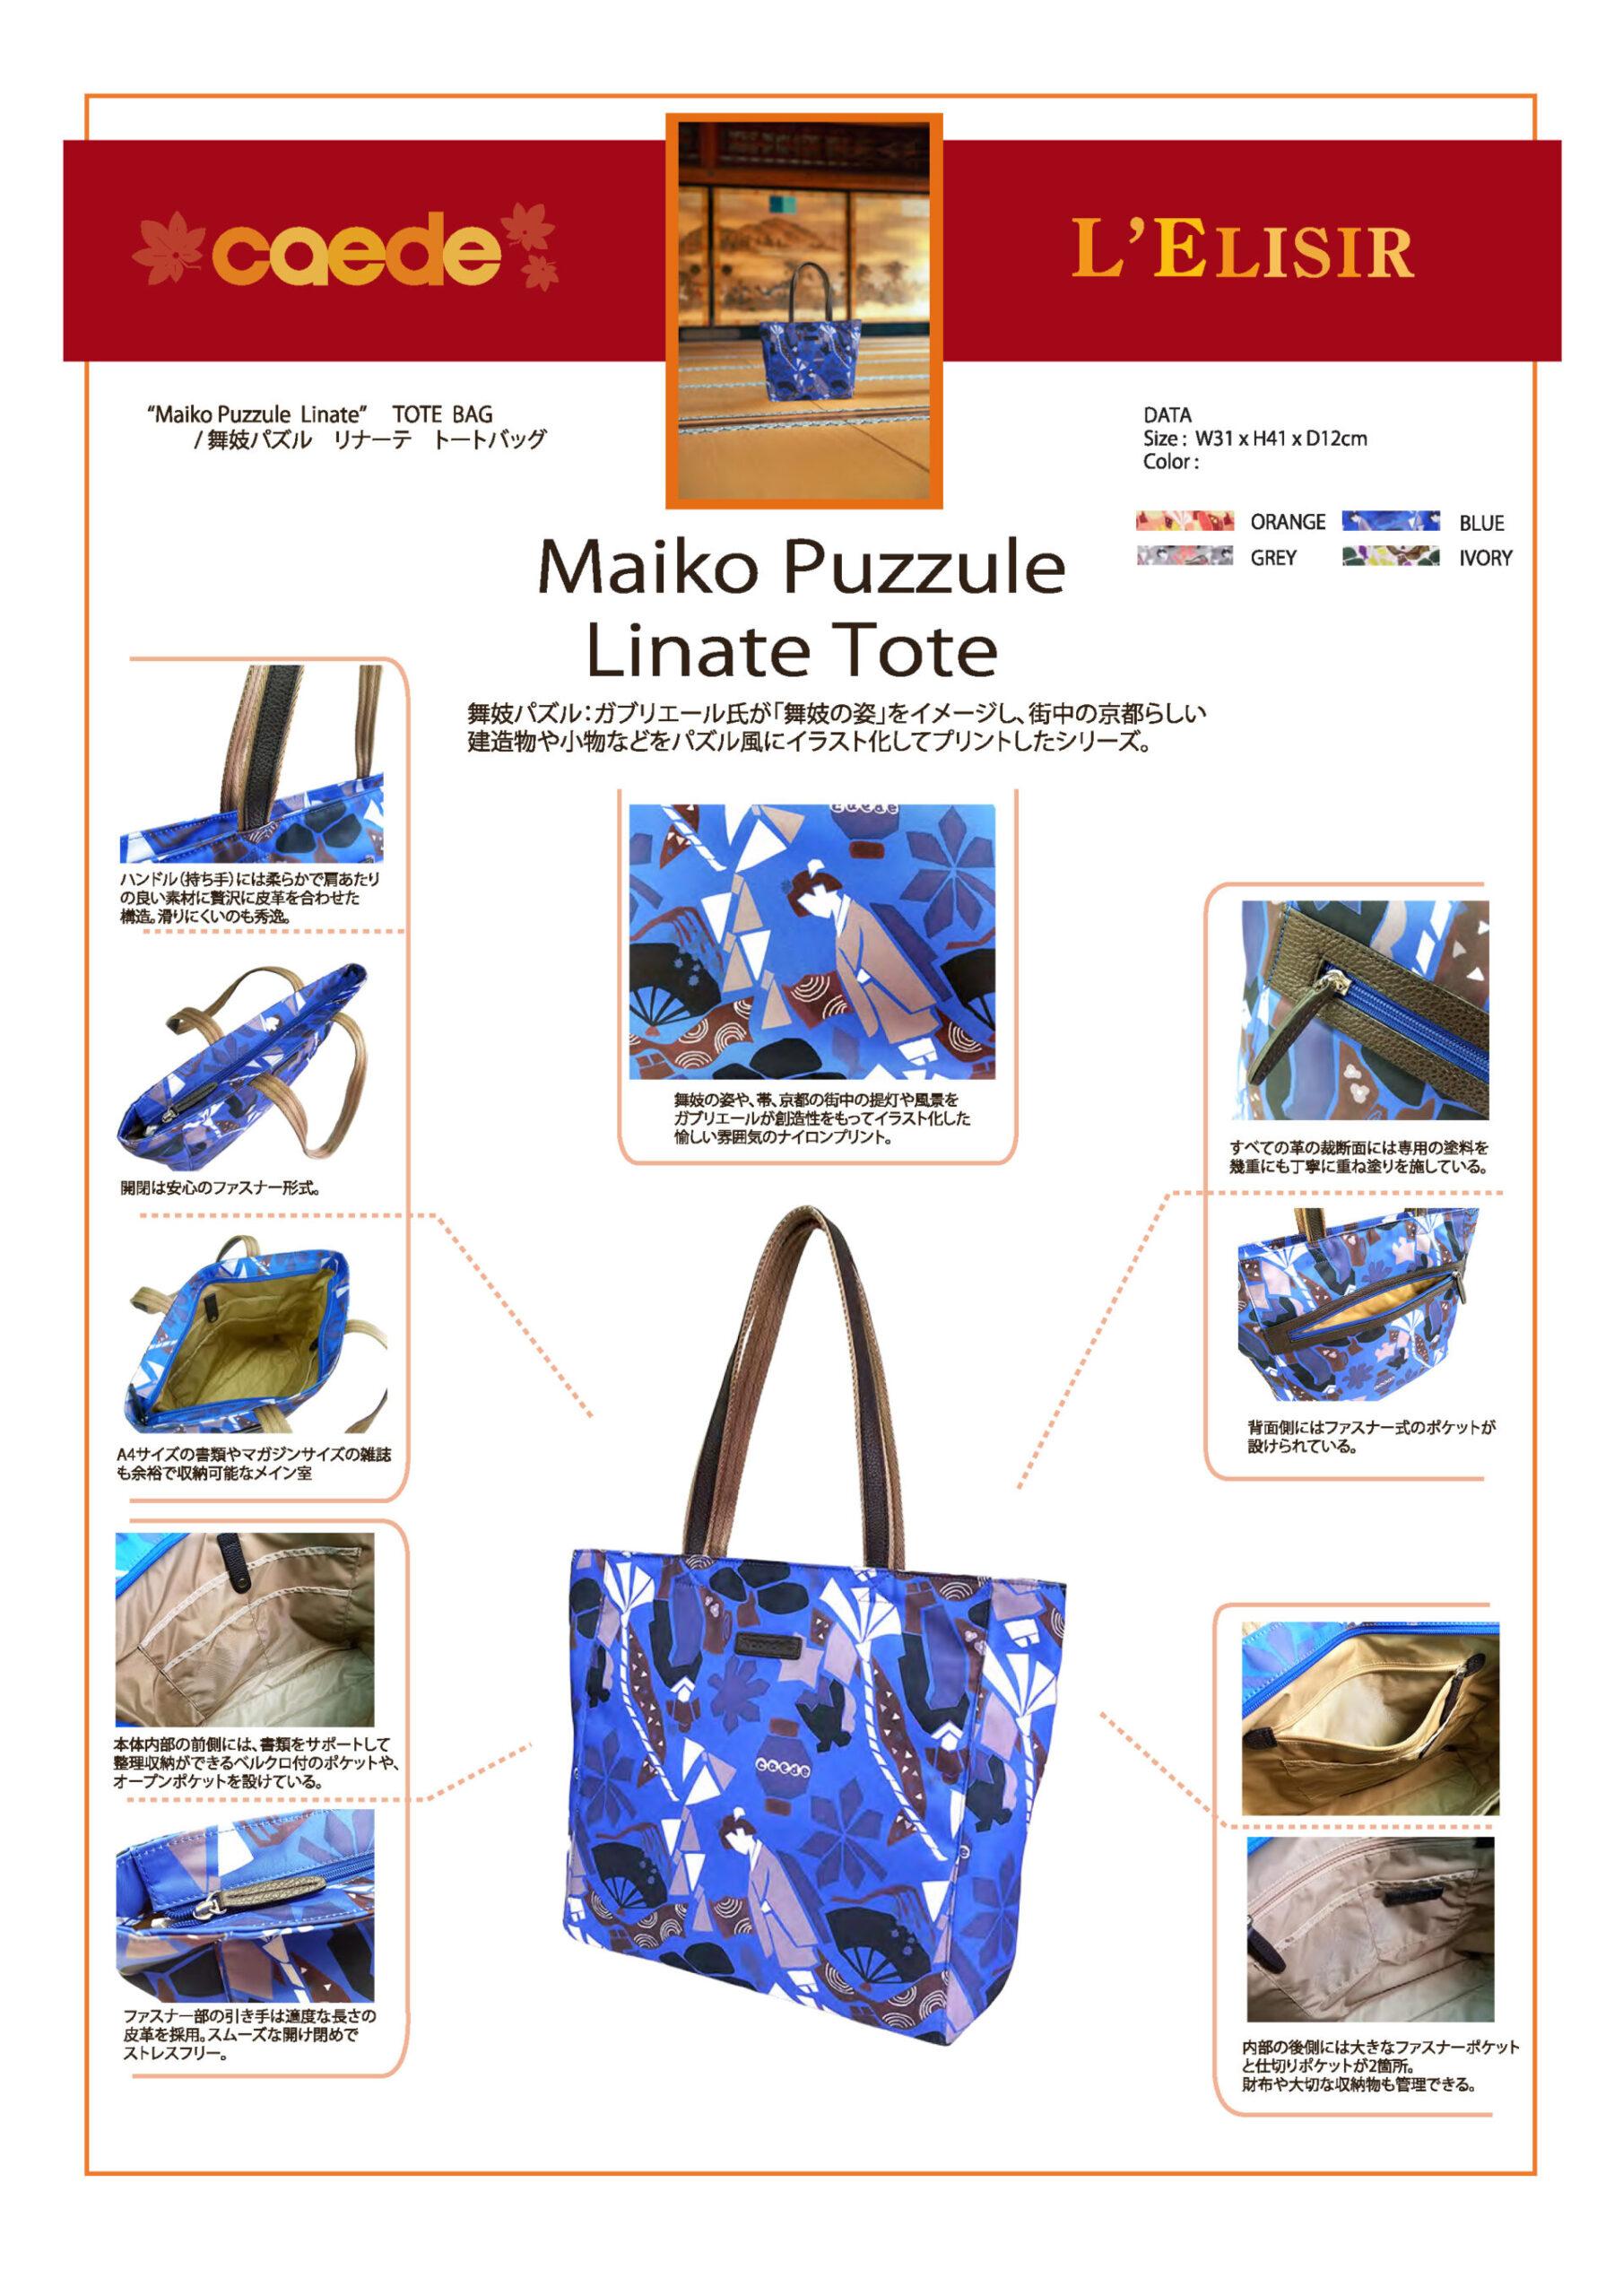 Maiko Puzzle Linate Tote